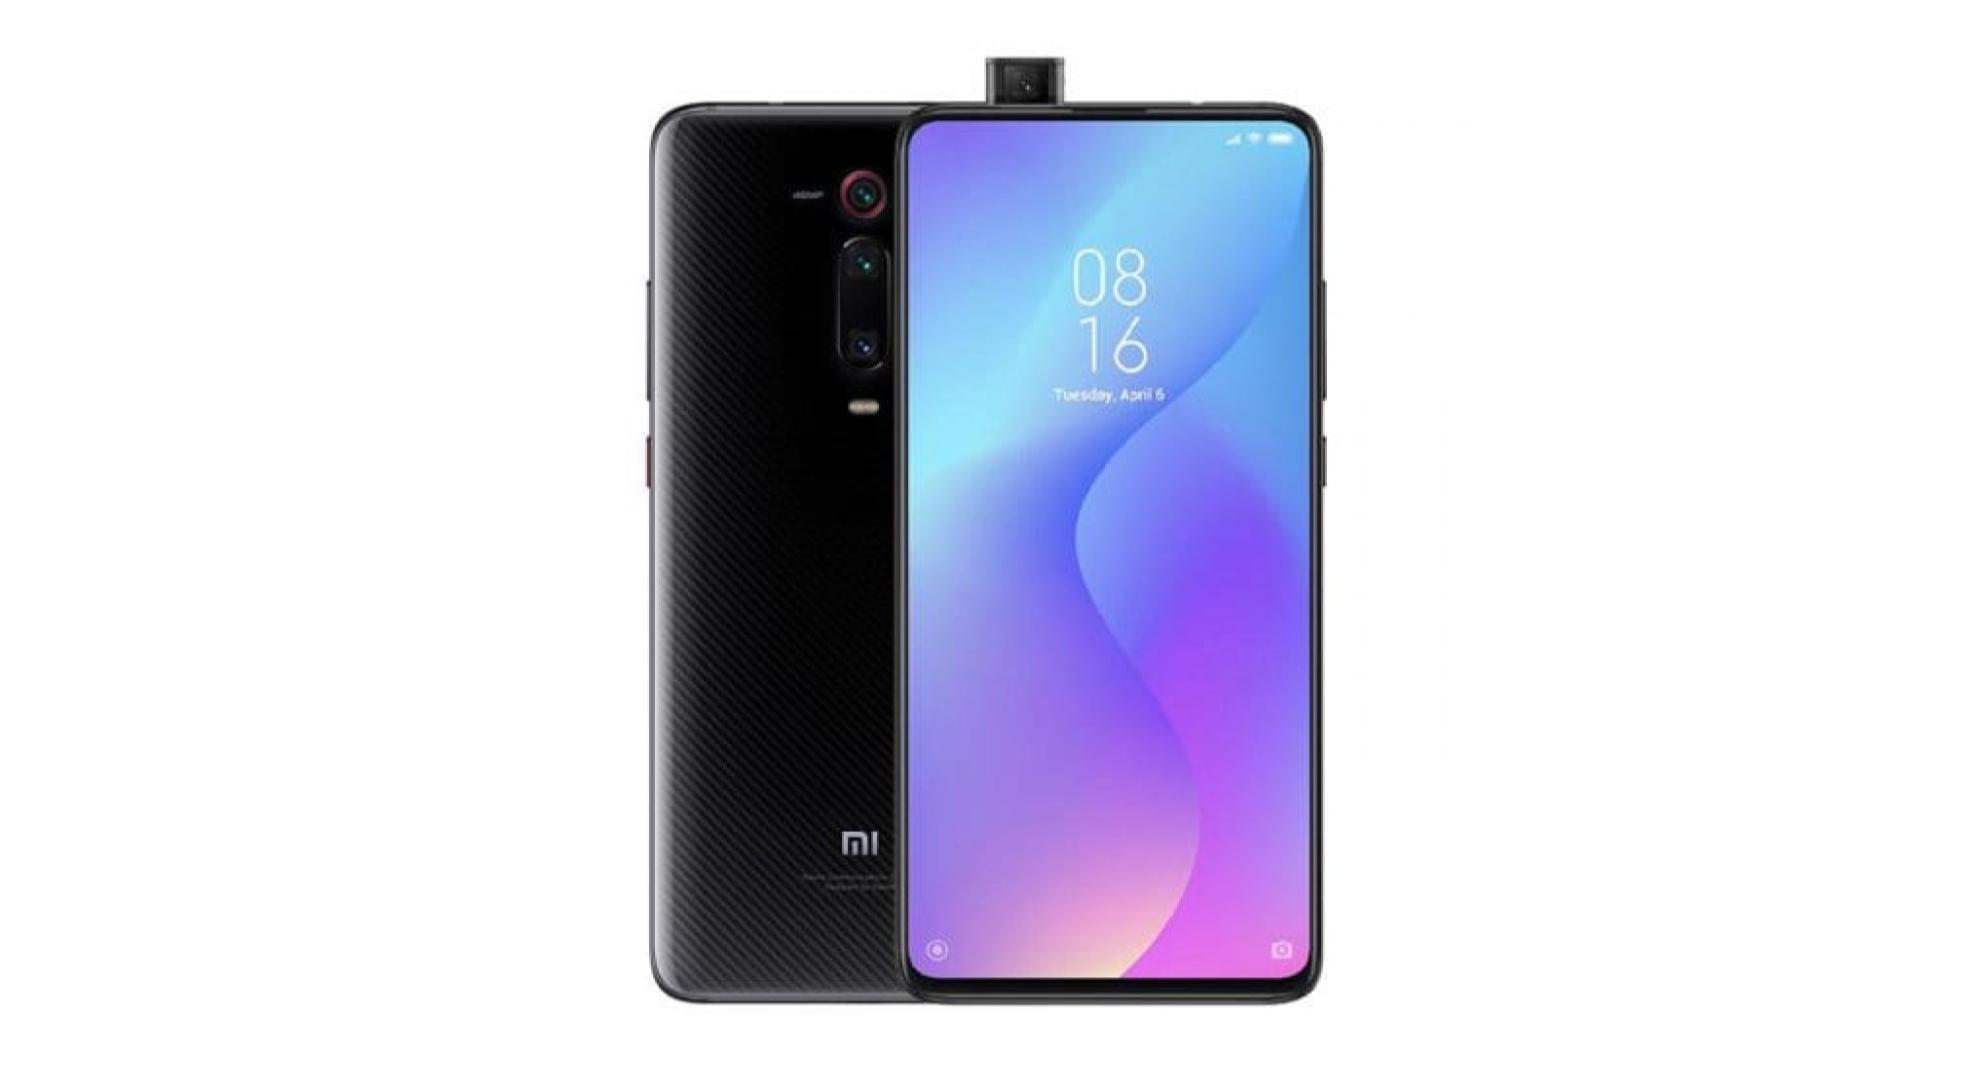 🔥 Soldes 2019 : le Xiaomi Mi 9T (ou Redmi K20) passe à 271 euros